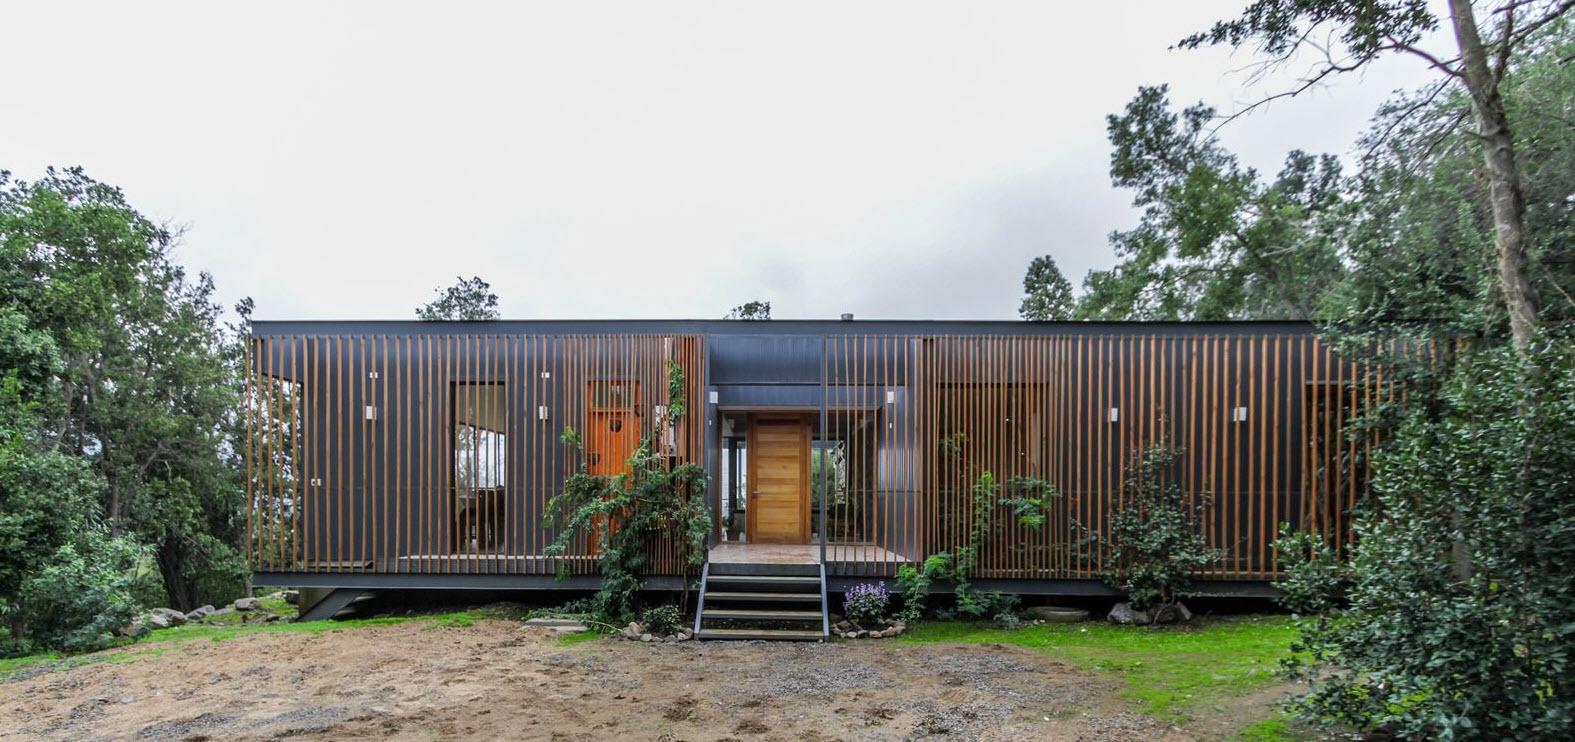 Planos casa de campo peque a y moderna construye hogar for Planos de casas de campo modernas